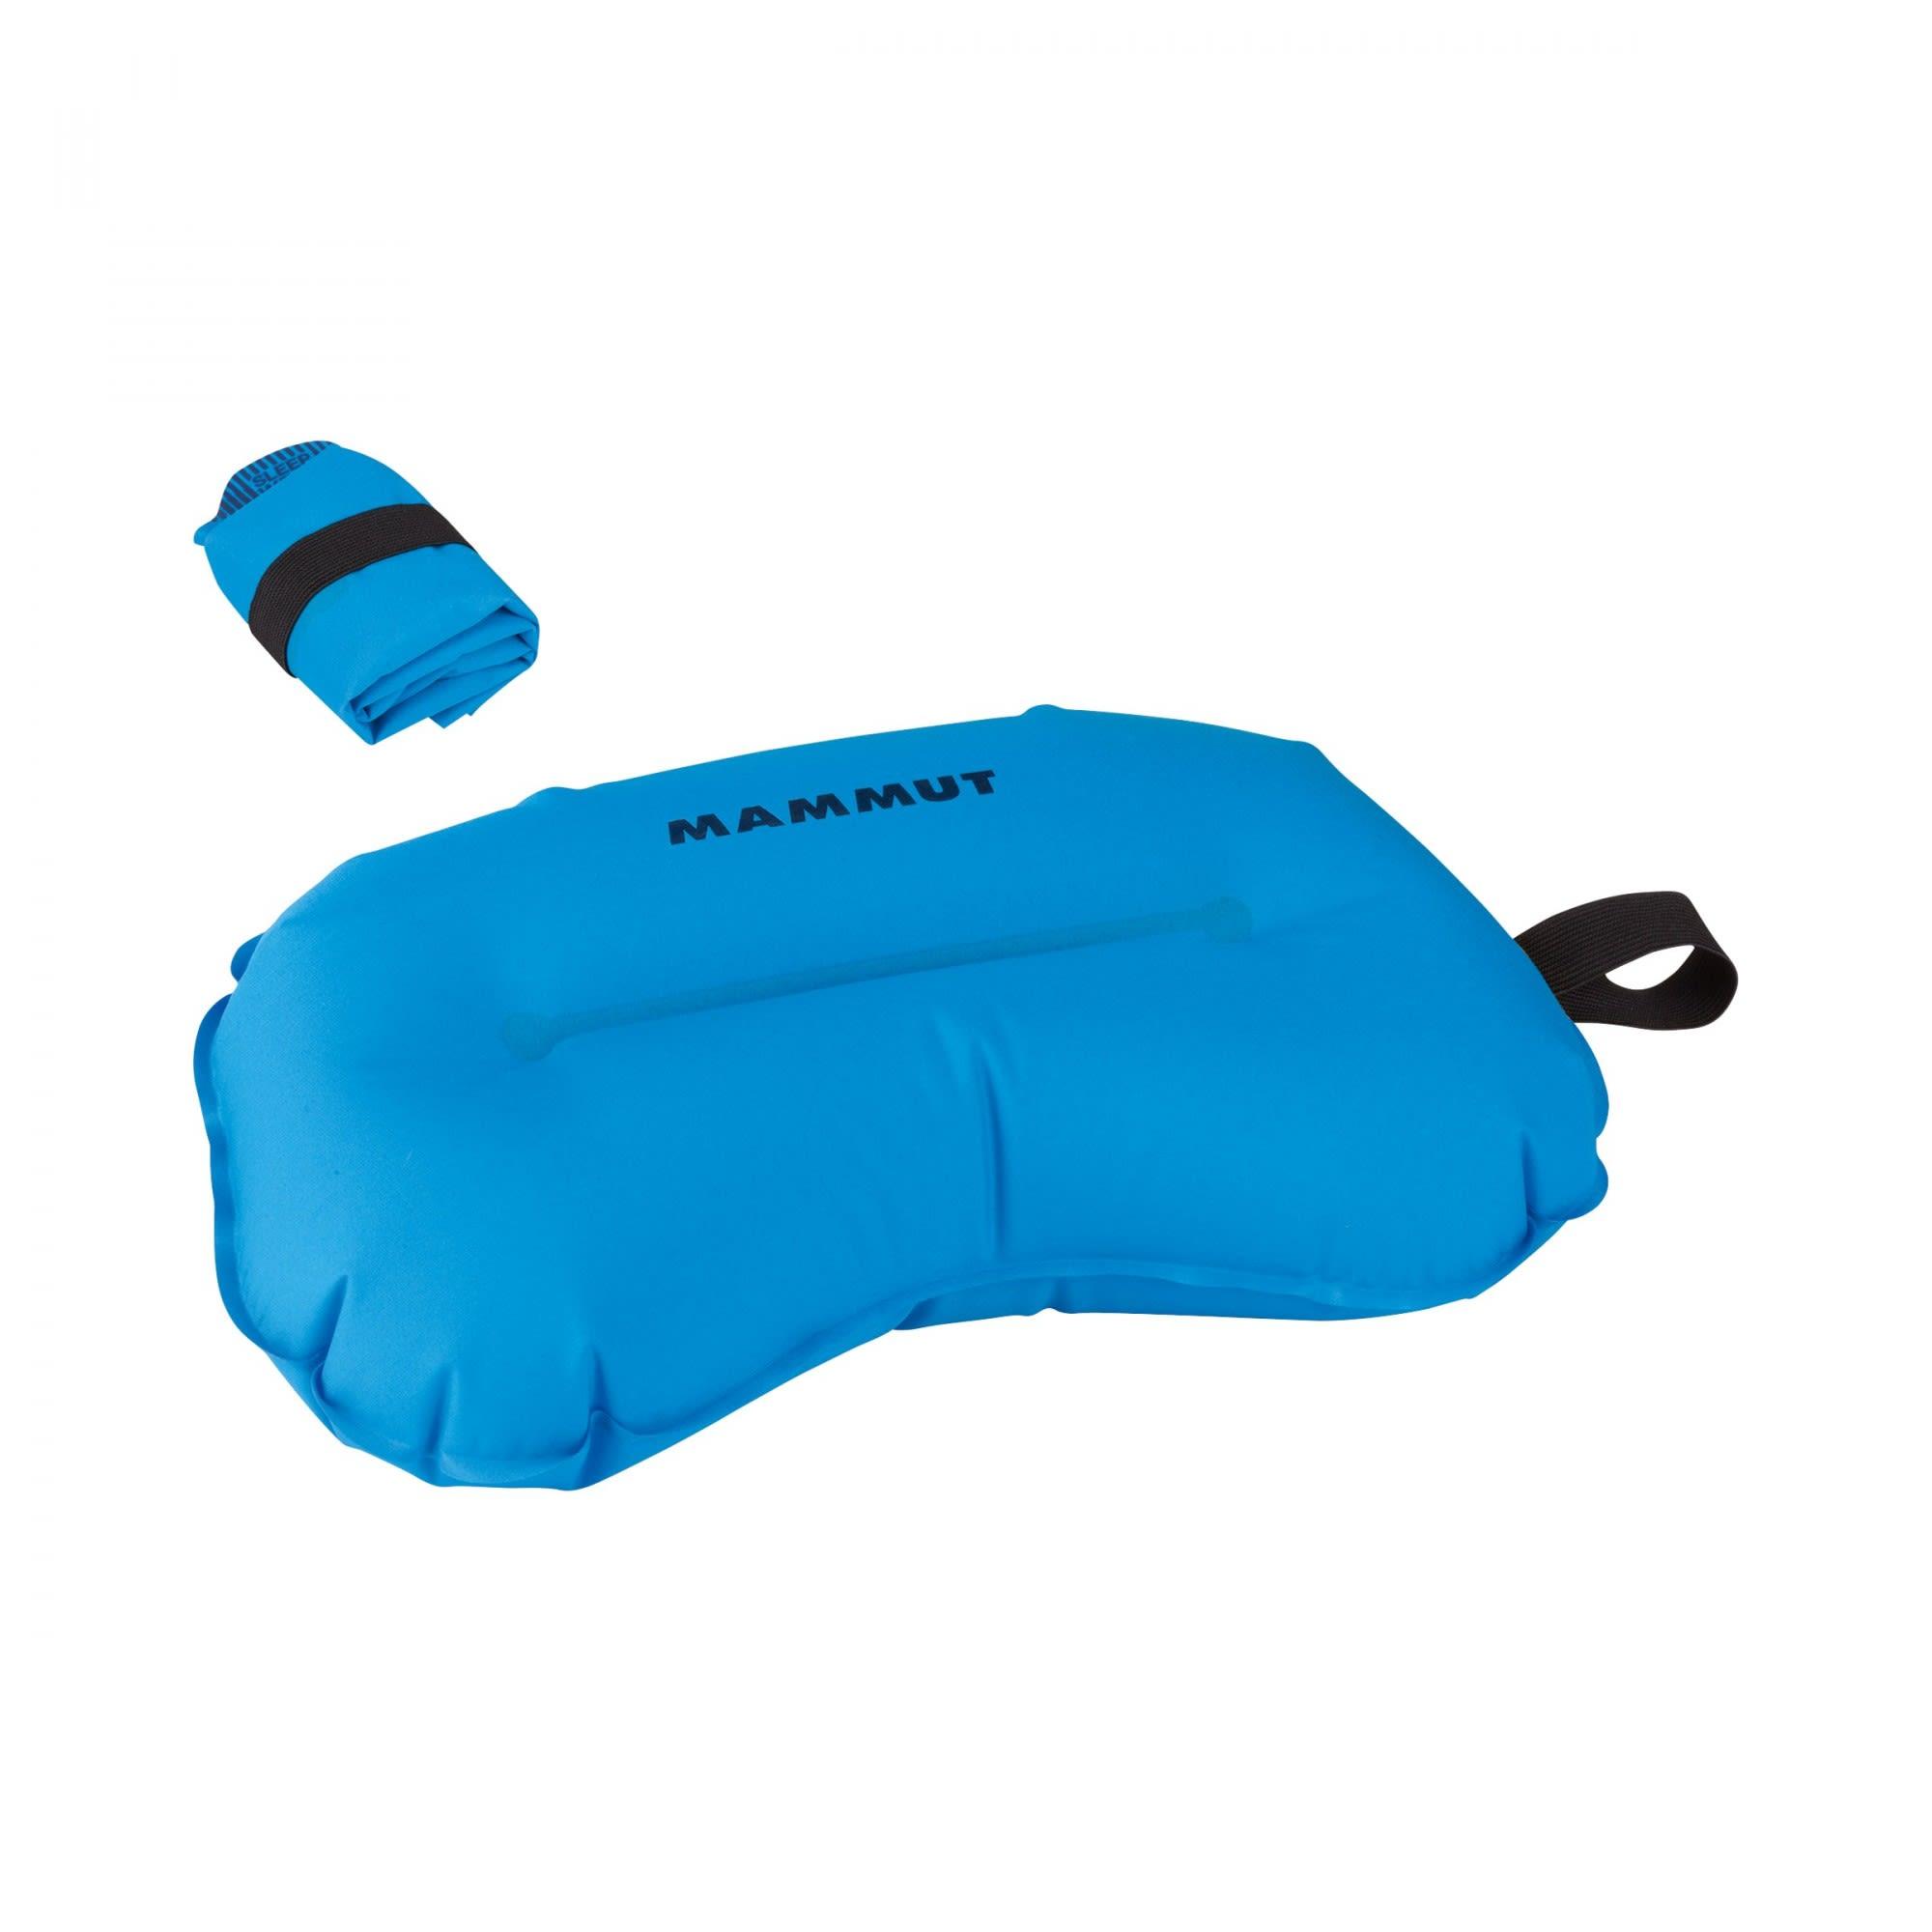 Mammut Air Pillow Blau, Kissen, One Size